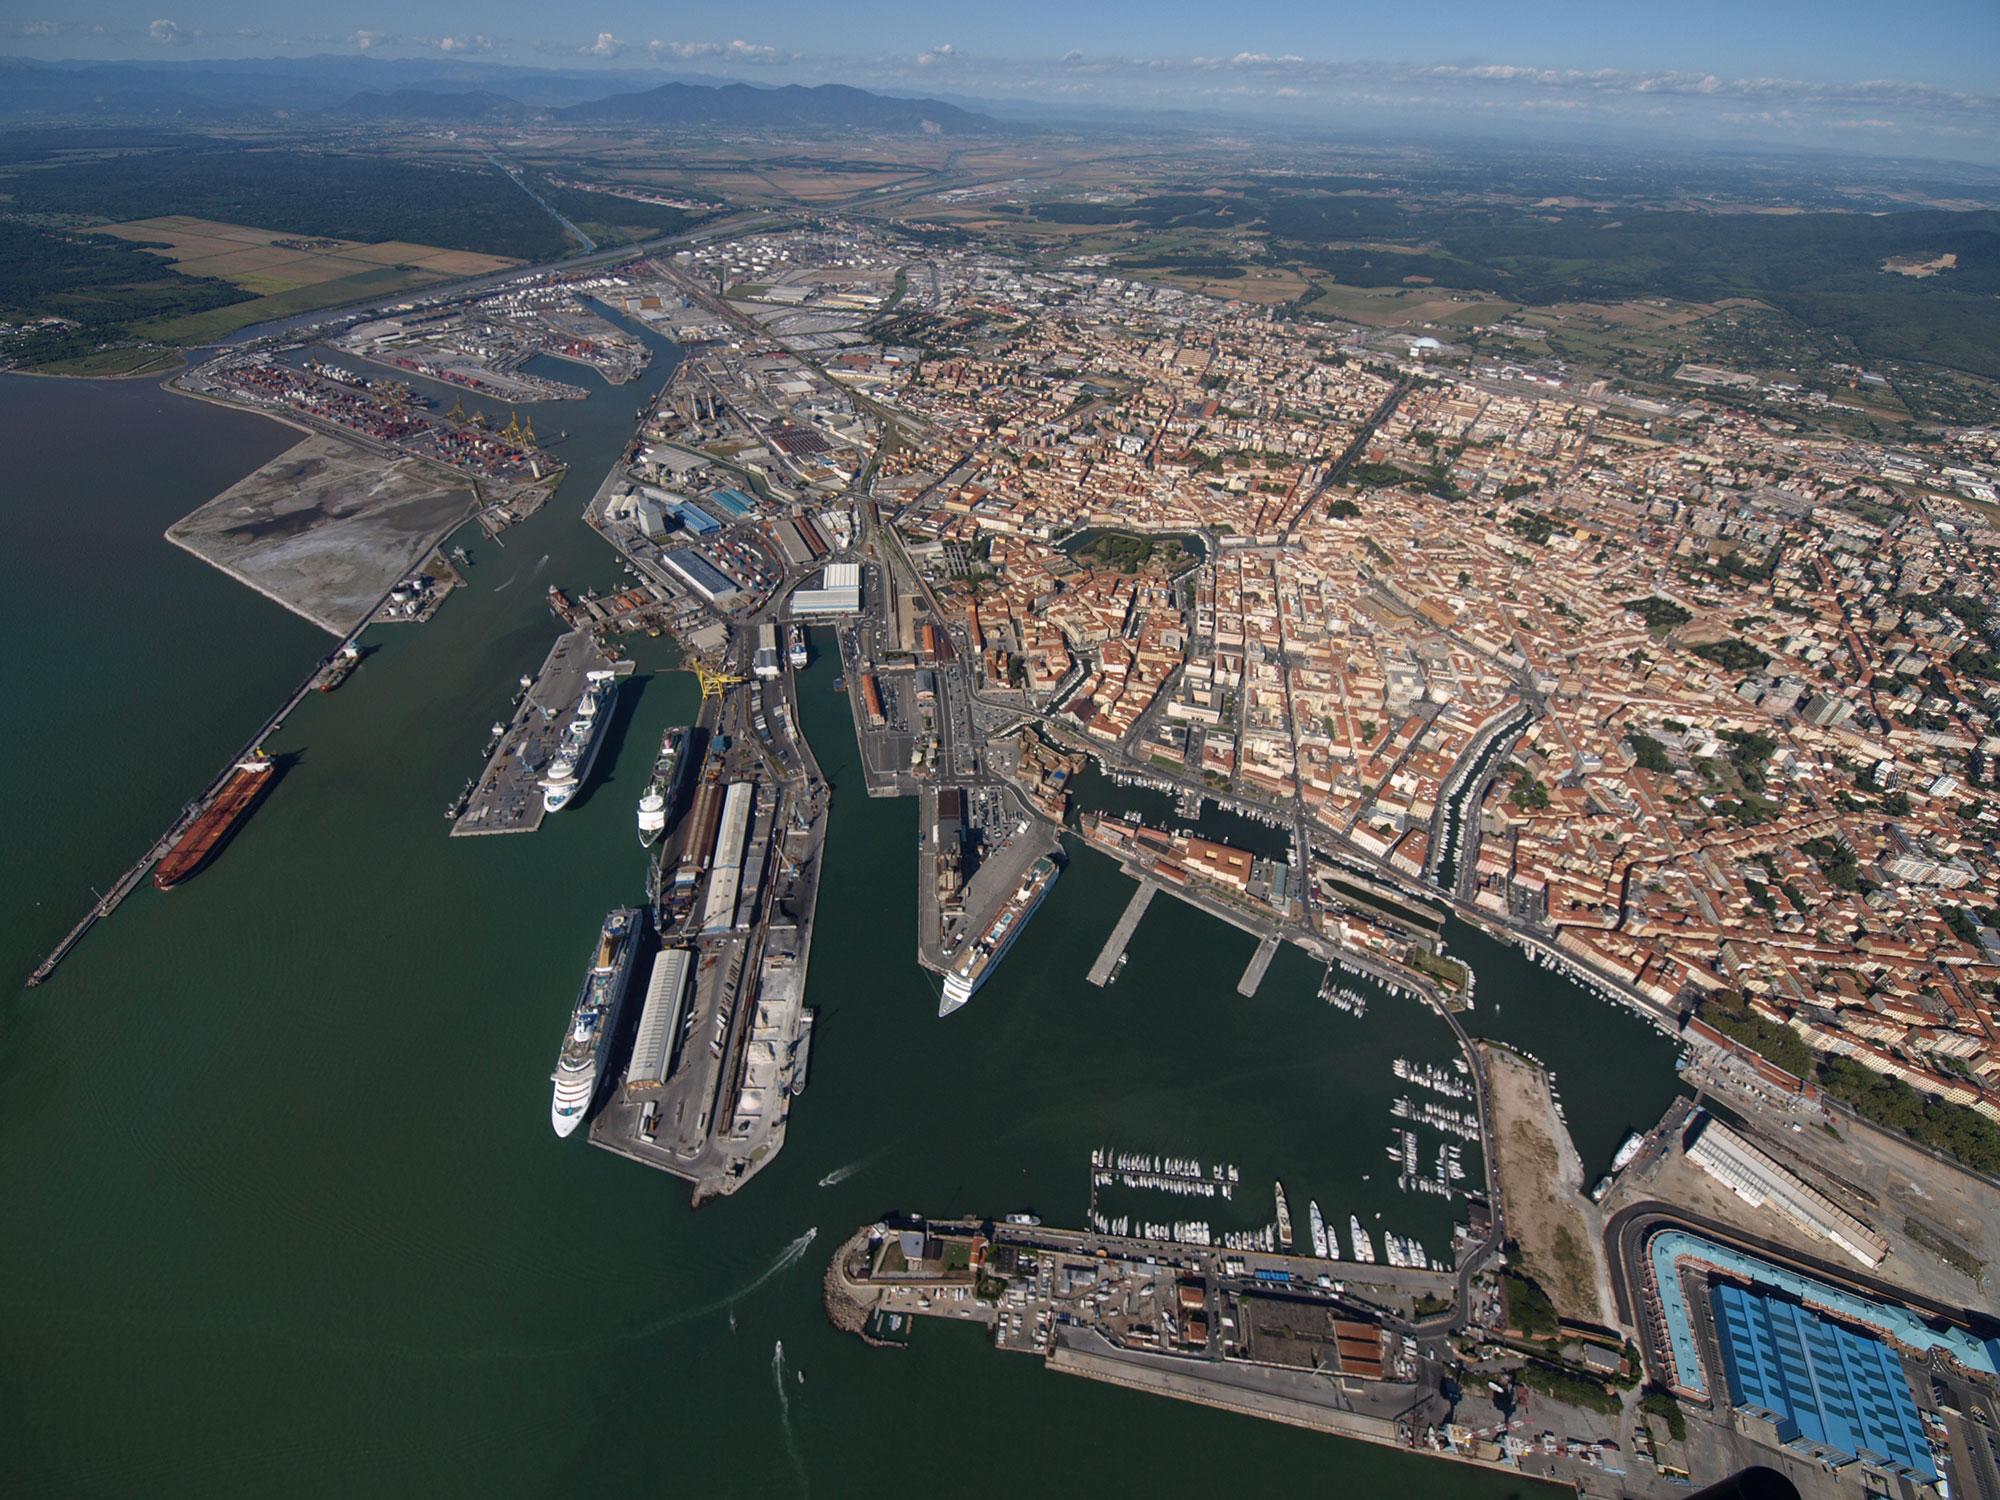 Port-of-Livorno-general-view-rid